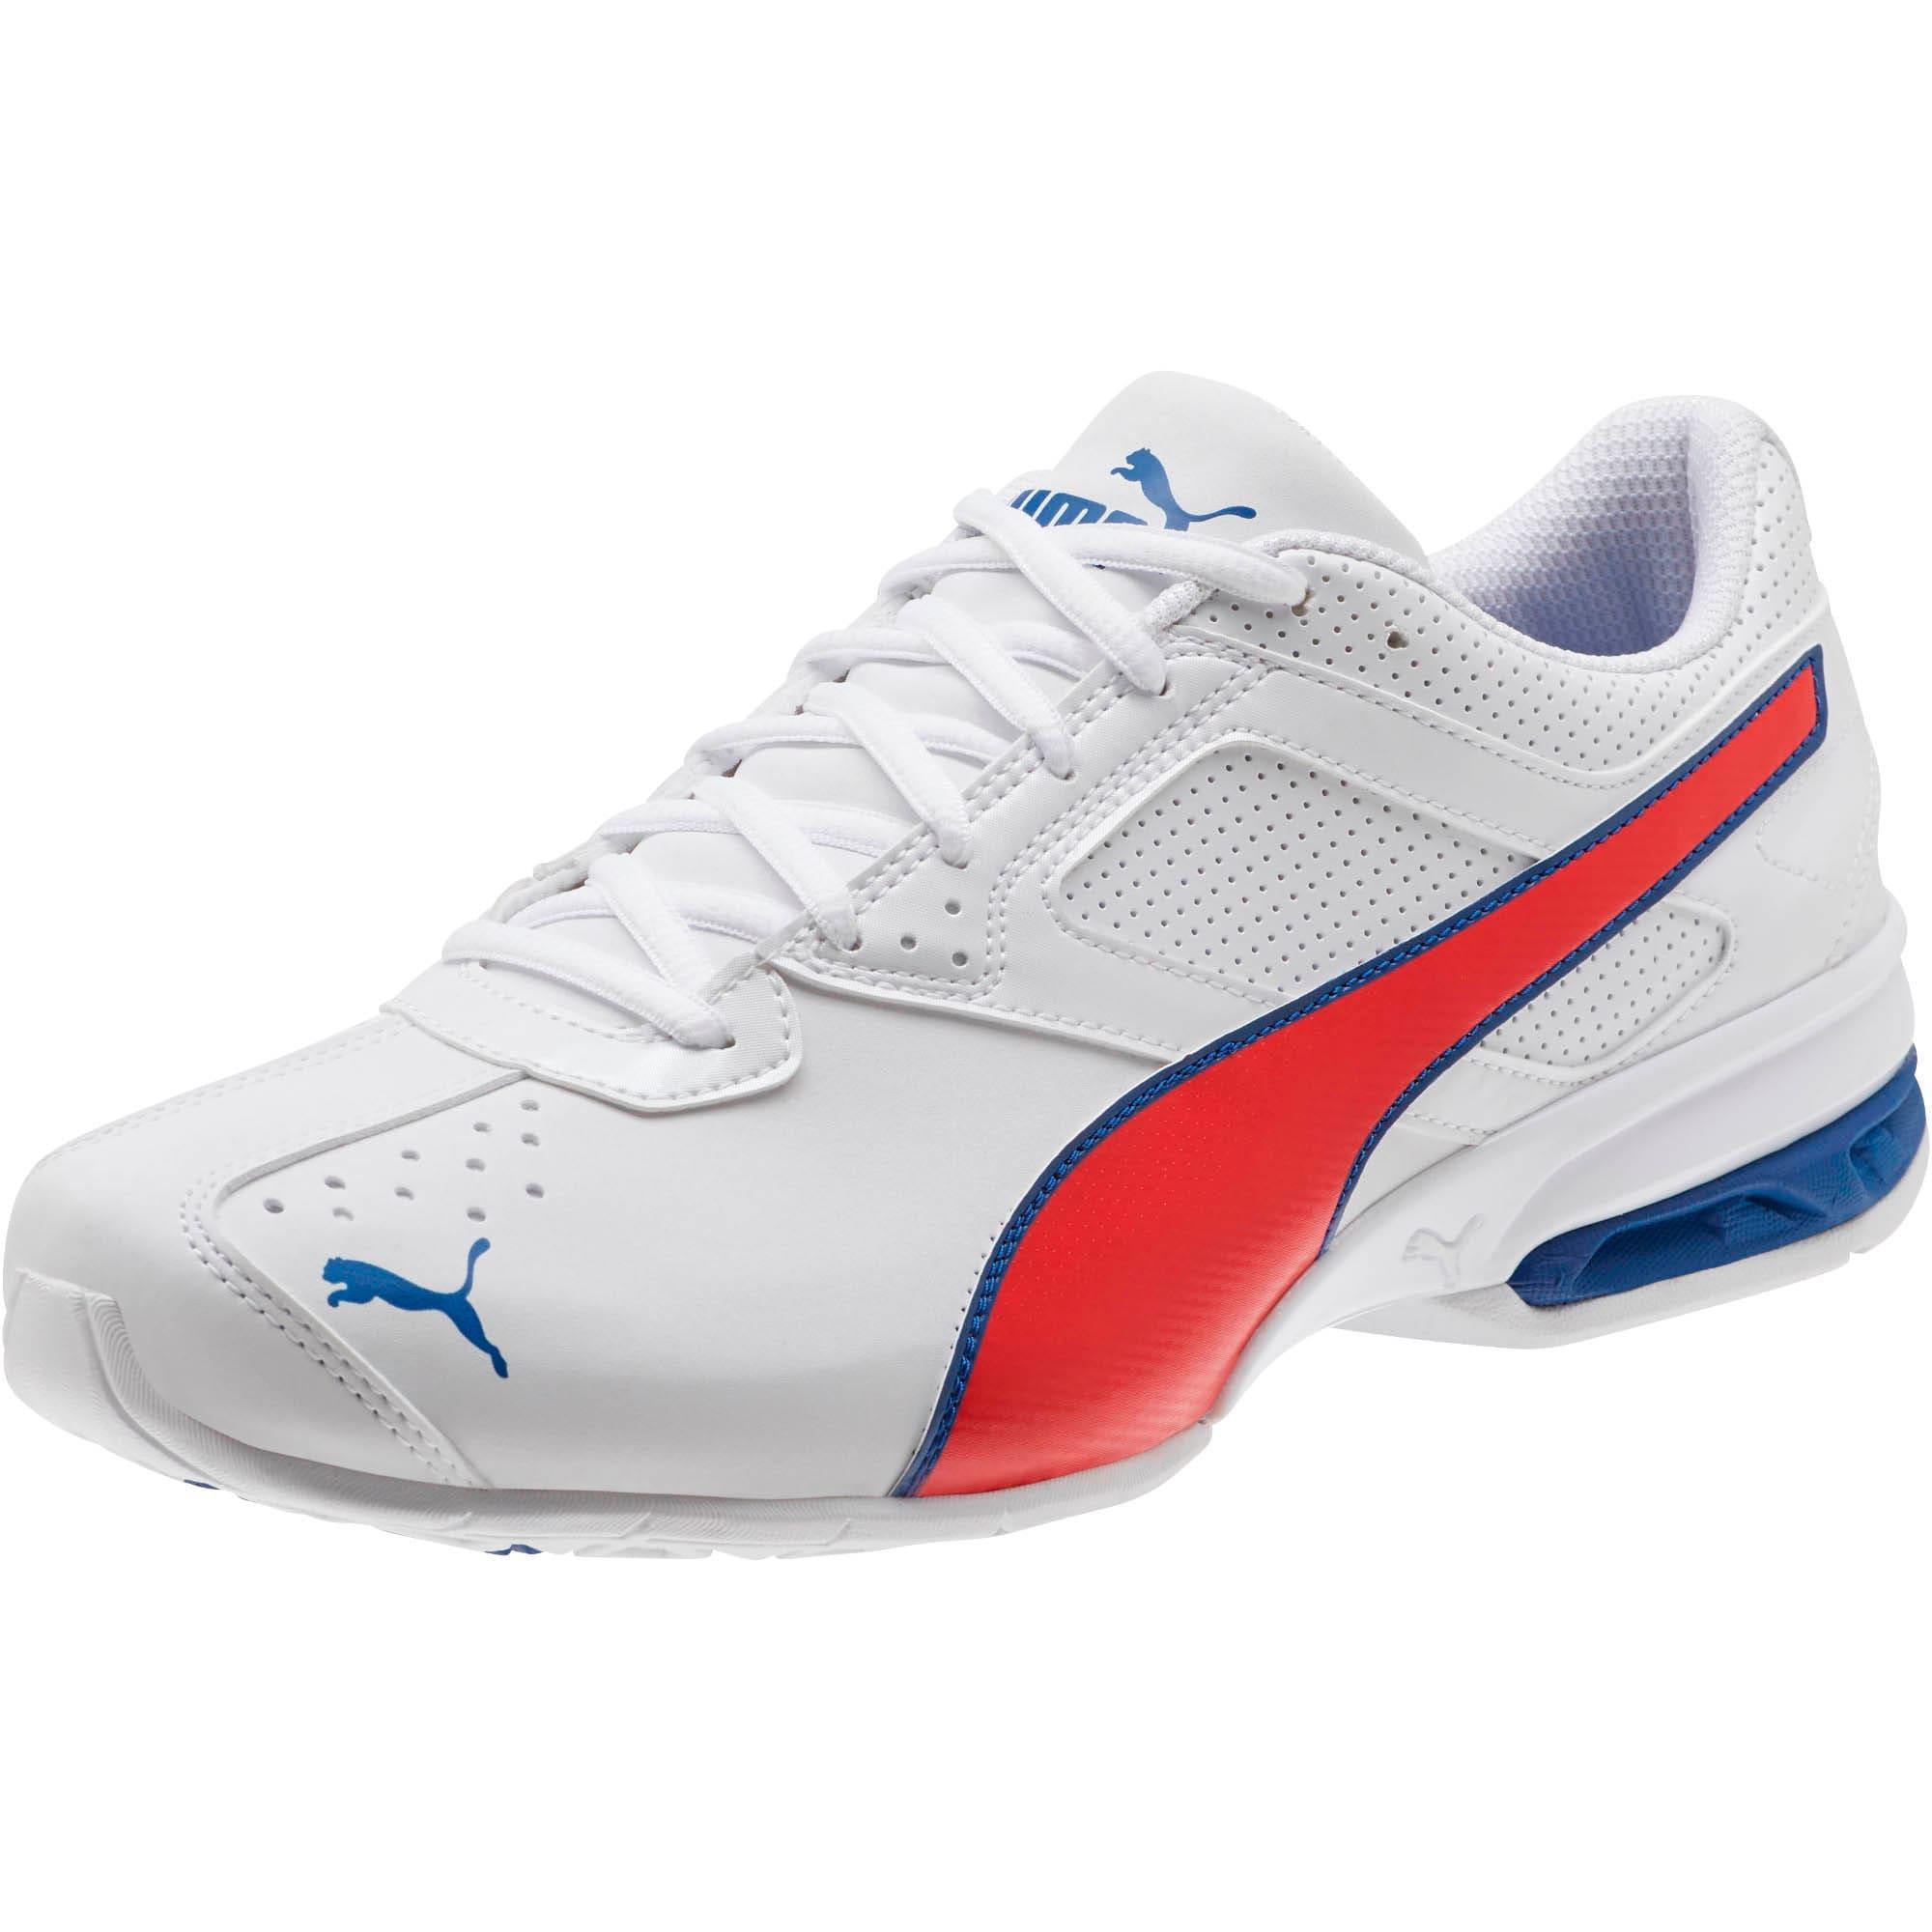 Thumbnail 1 of Tazon 6 FM Men's Sneakers, P White-Glaxy Blue-H Risk Rd, medium